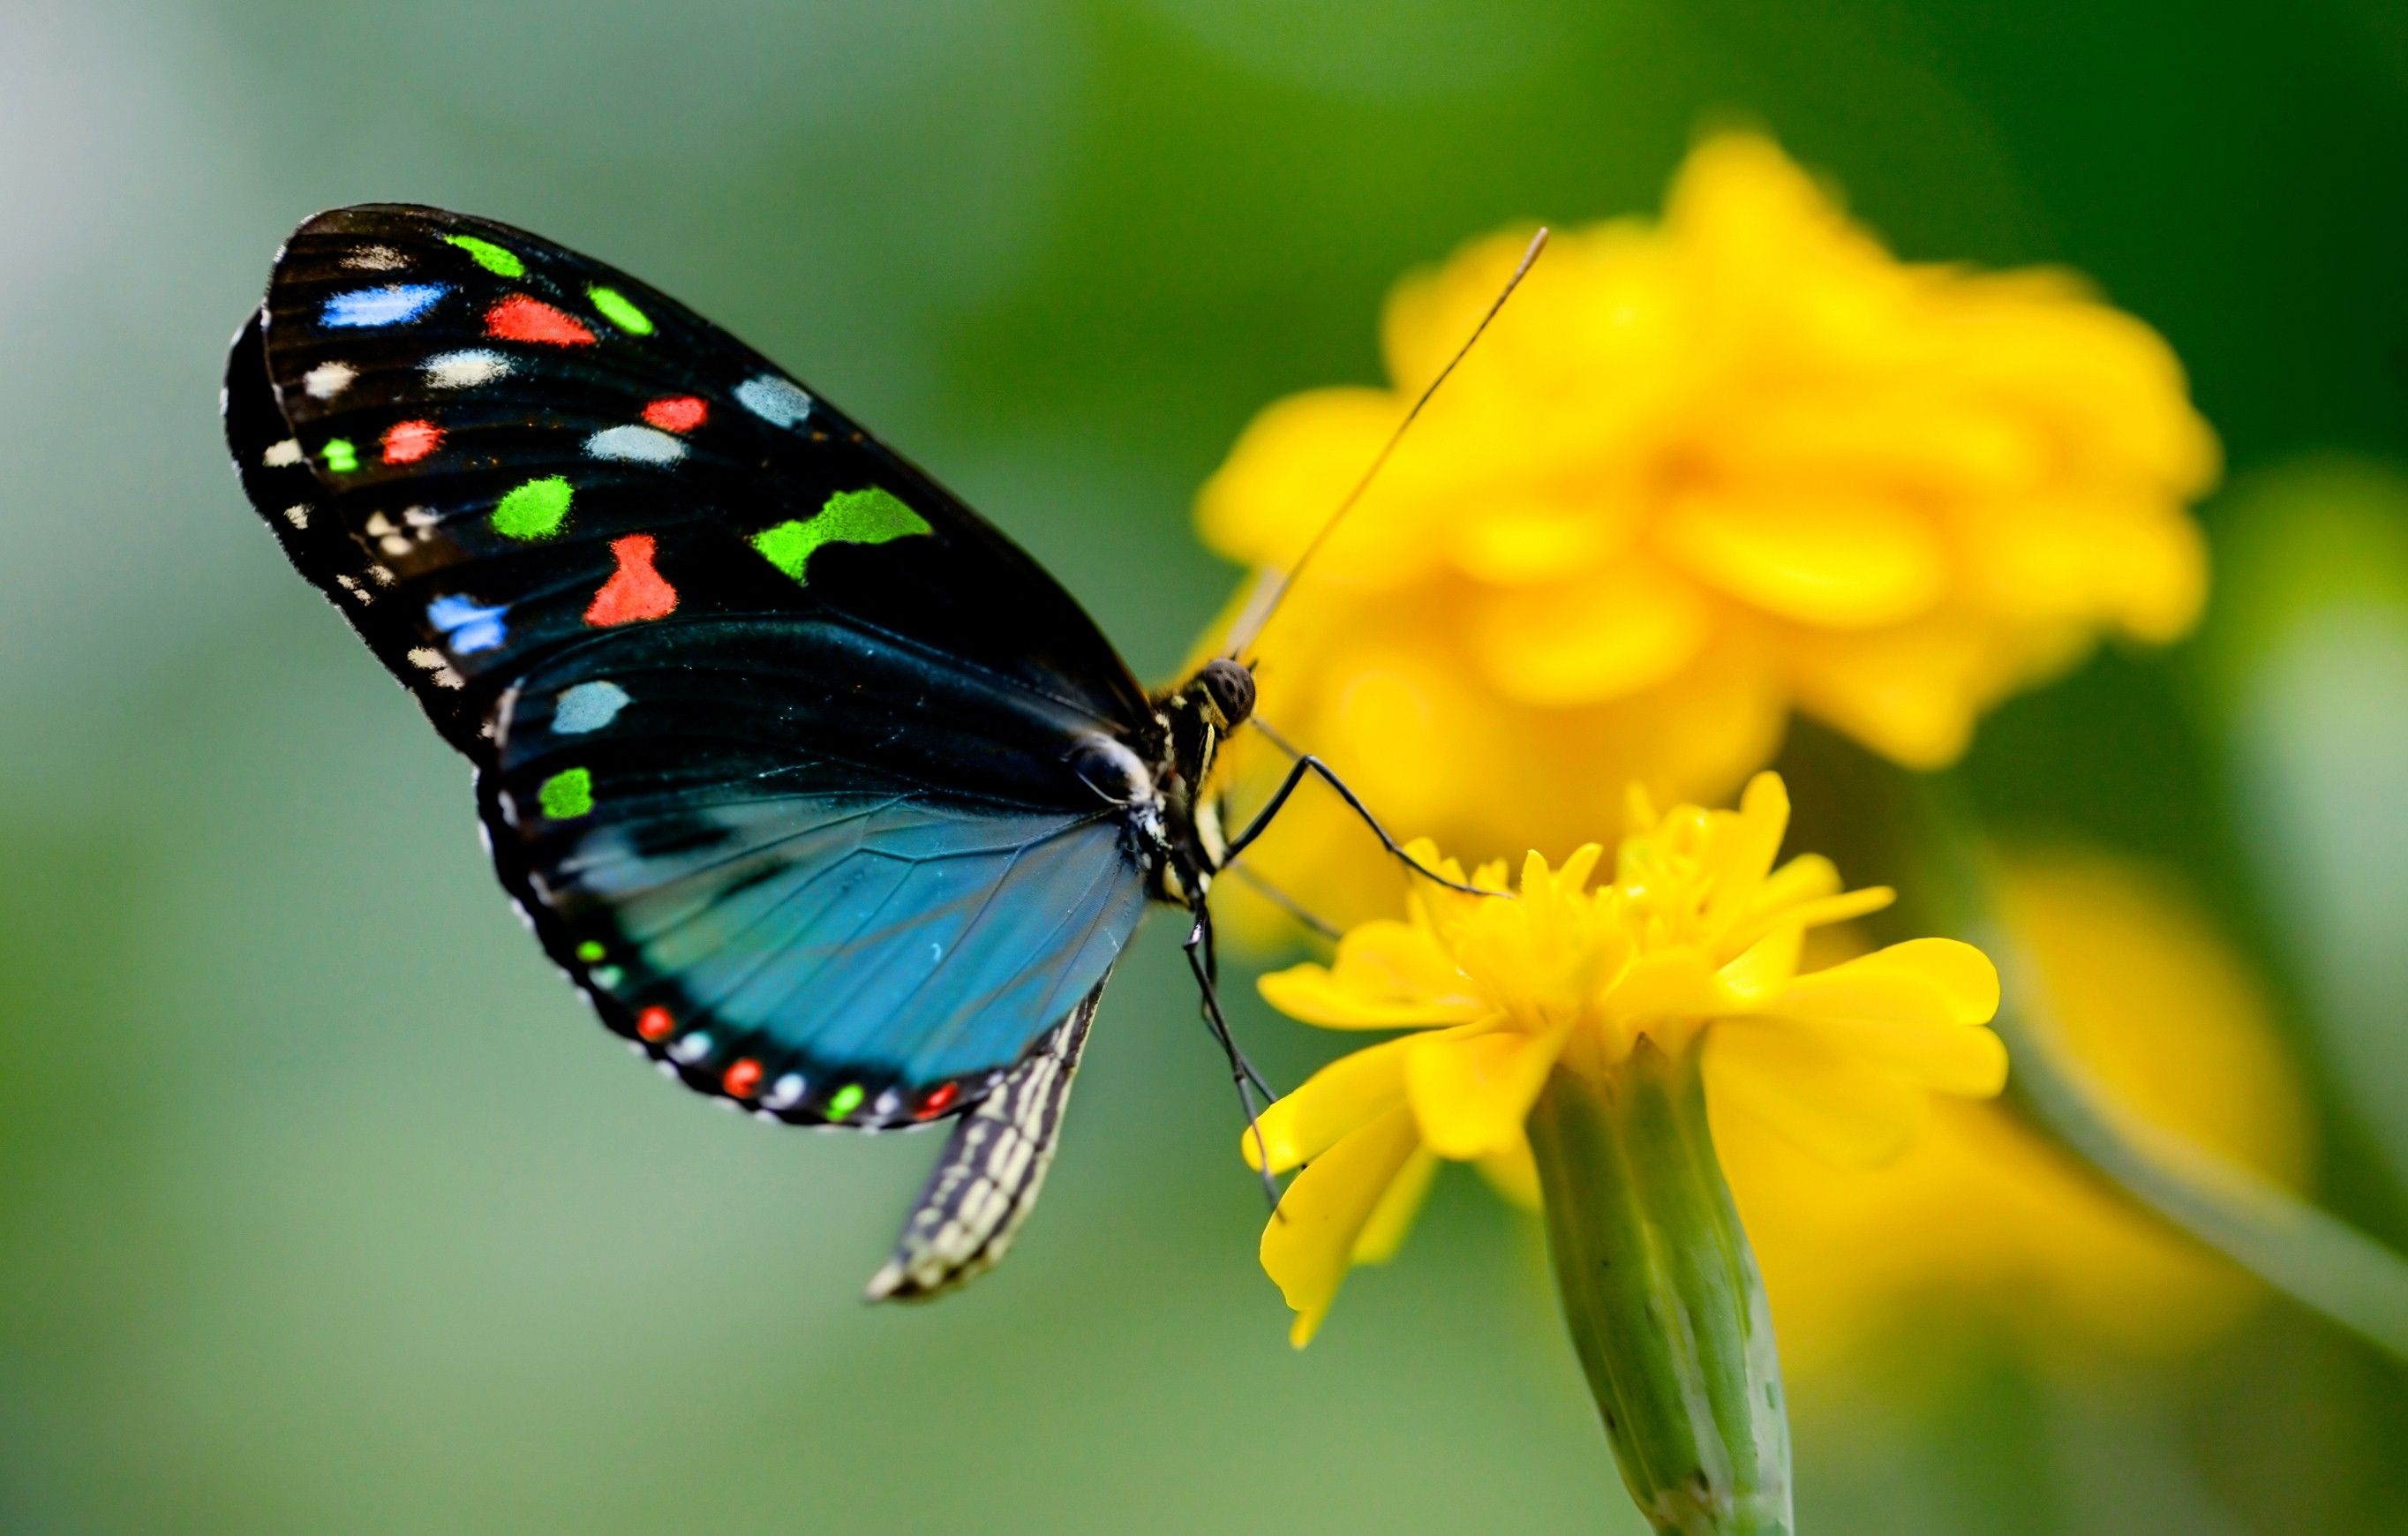 Beautiful Butterfly Wallpapers Top Free Beautiful Butterfly